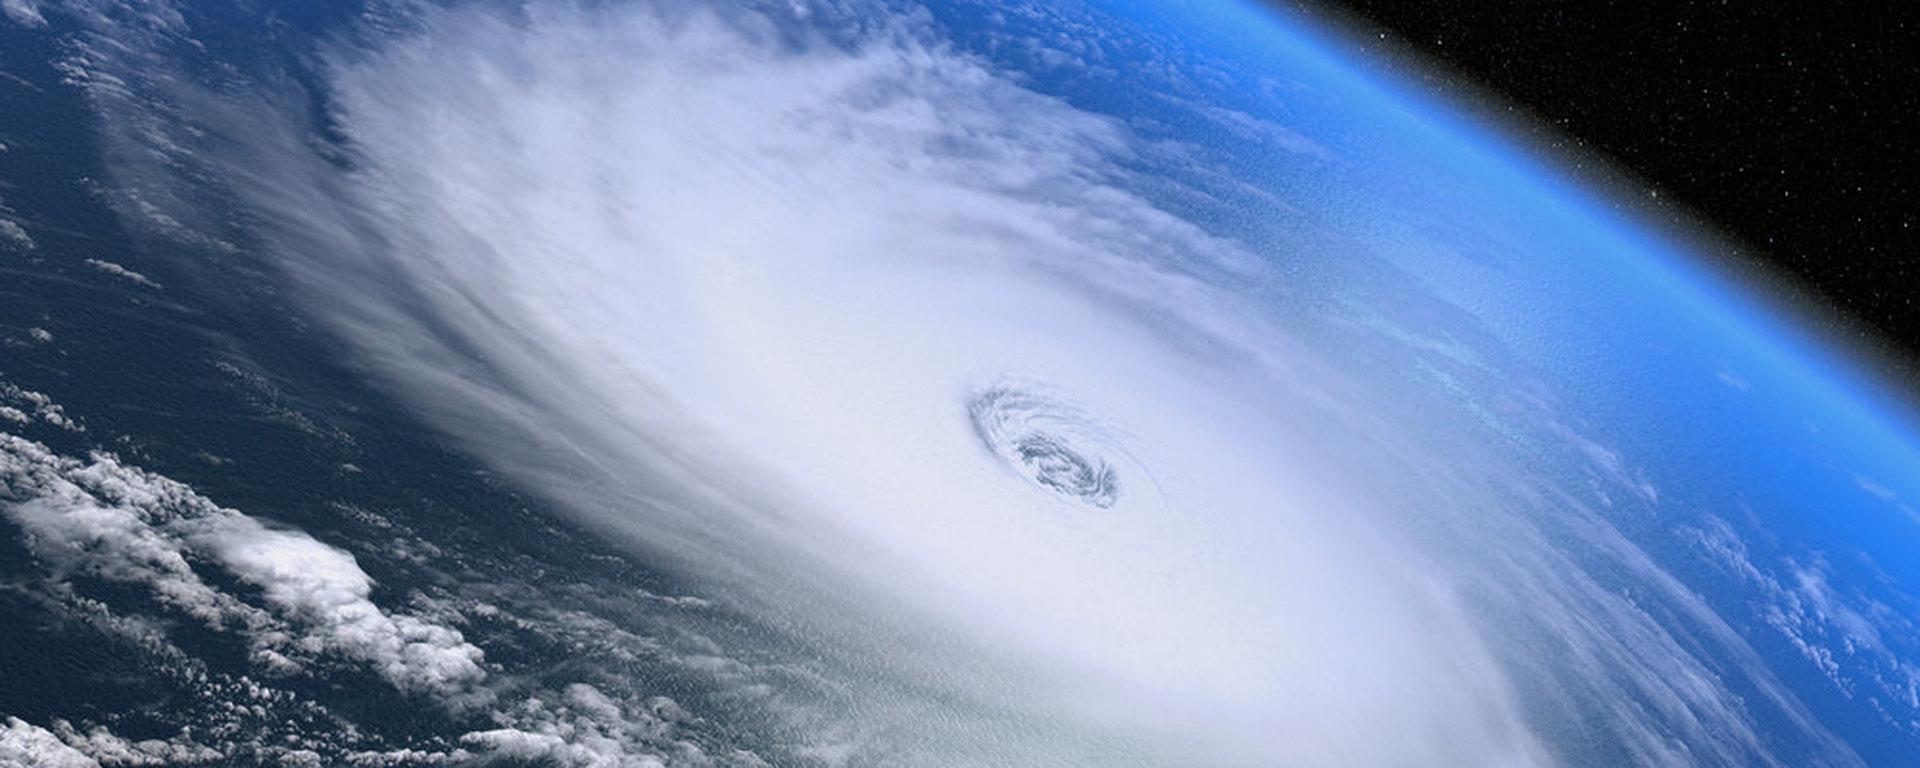 "В Вашингтоне объявили режим ЧП из-за урагана ""Флоренс"""